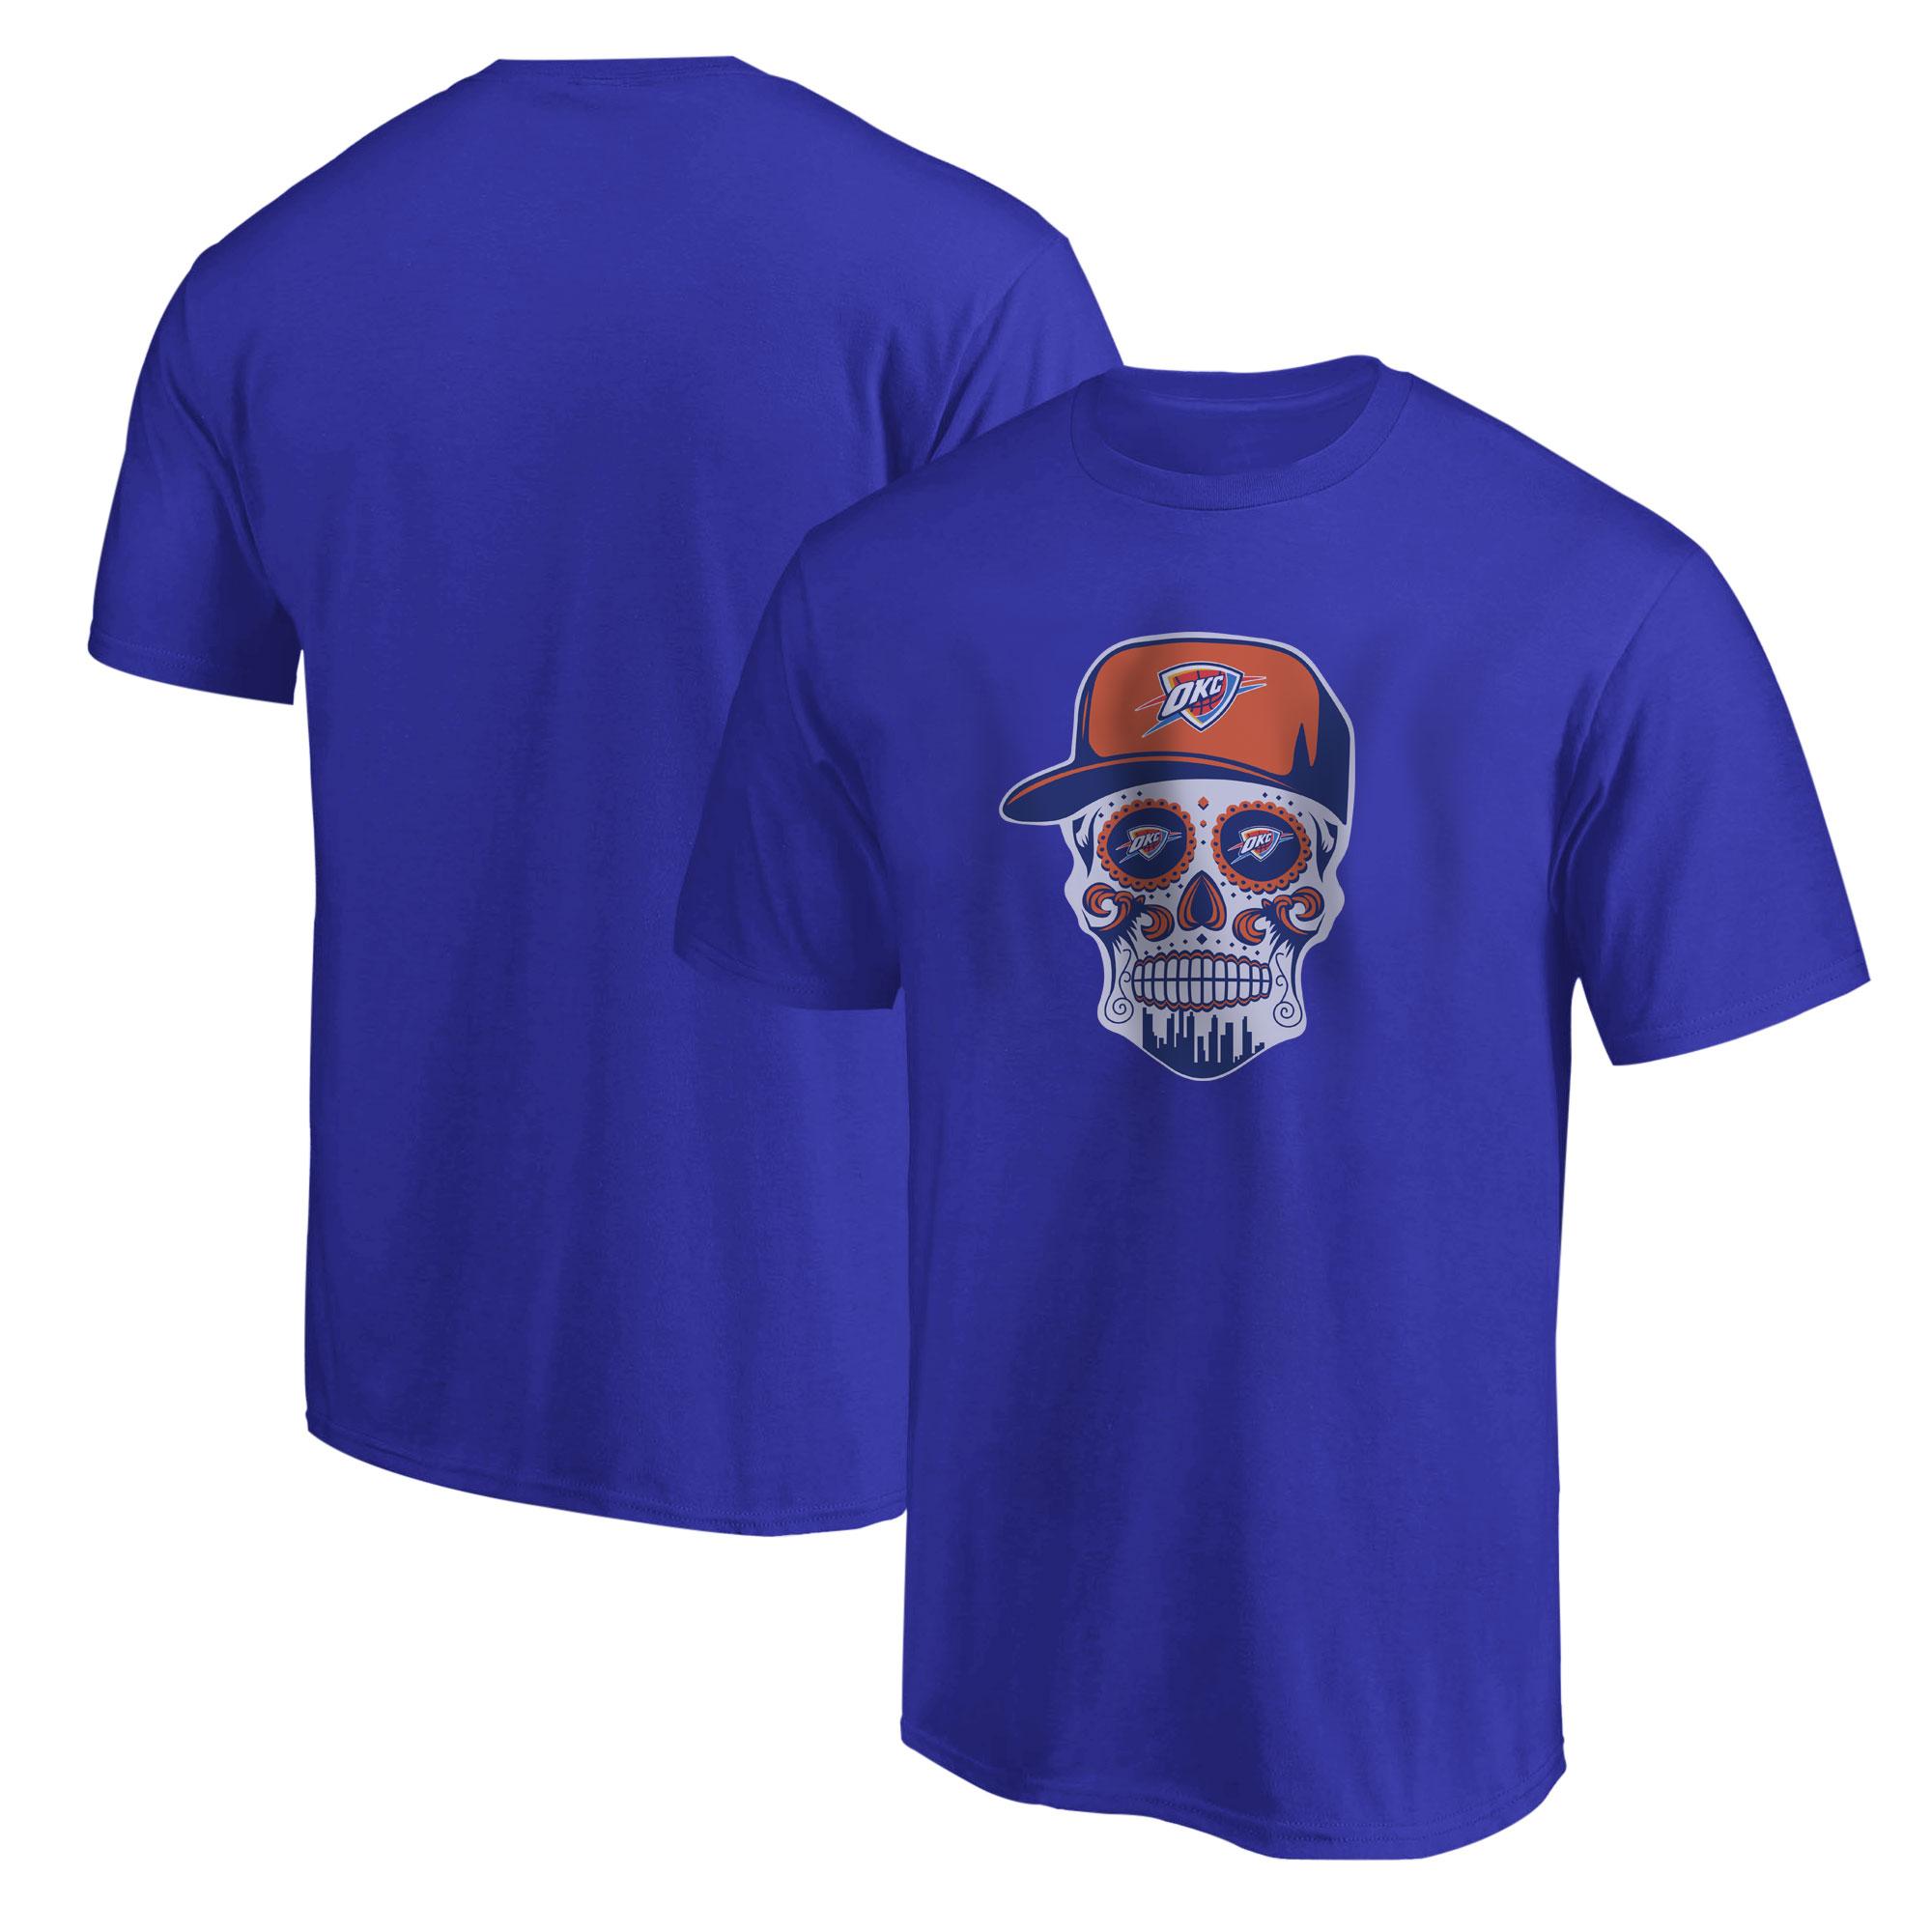 Thunder Skull Tshirt (TSH-BLU-NP-459-NBA-OKC-SKULL)